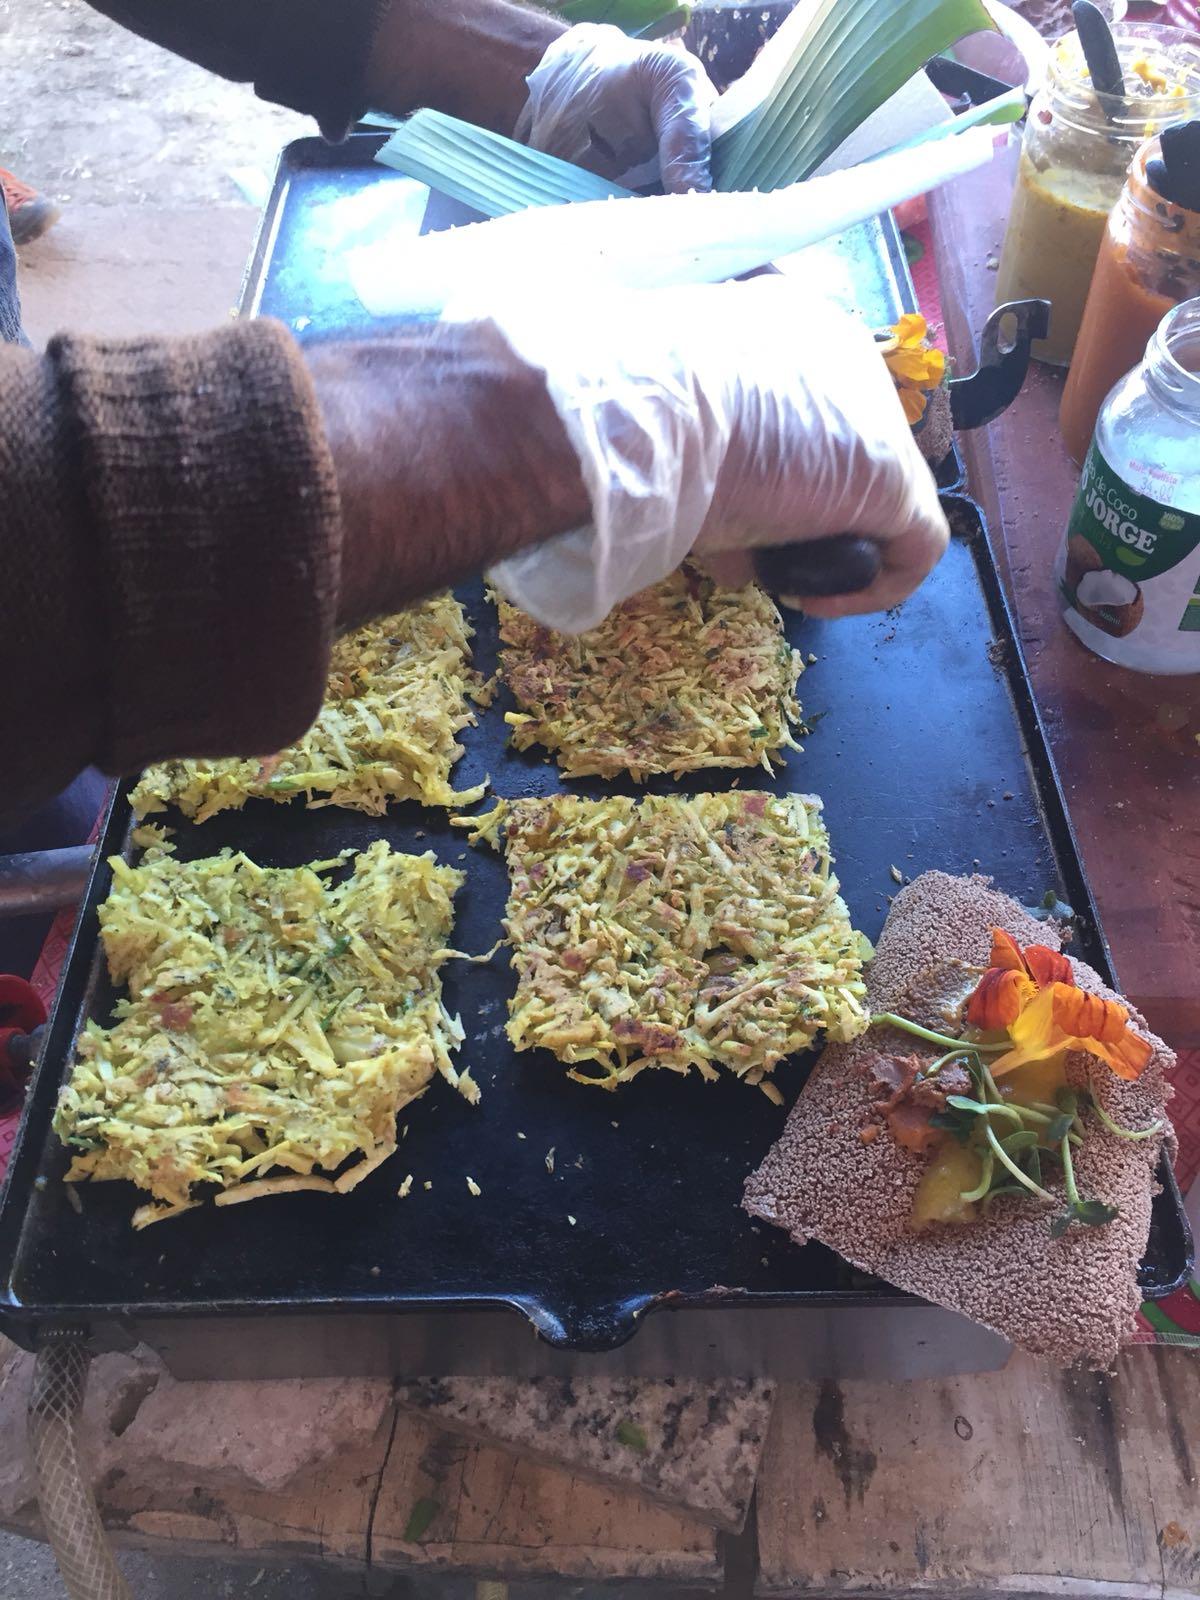 Feira Orgânica de produtos locais de Alto Paraíso, Chapada dos Veadeiros